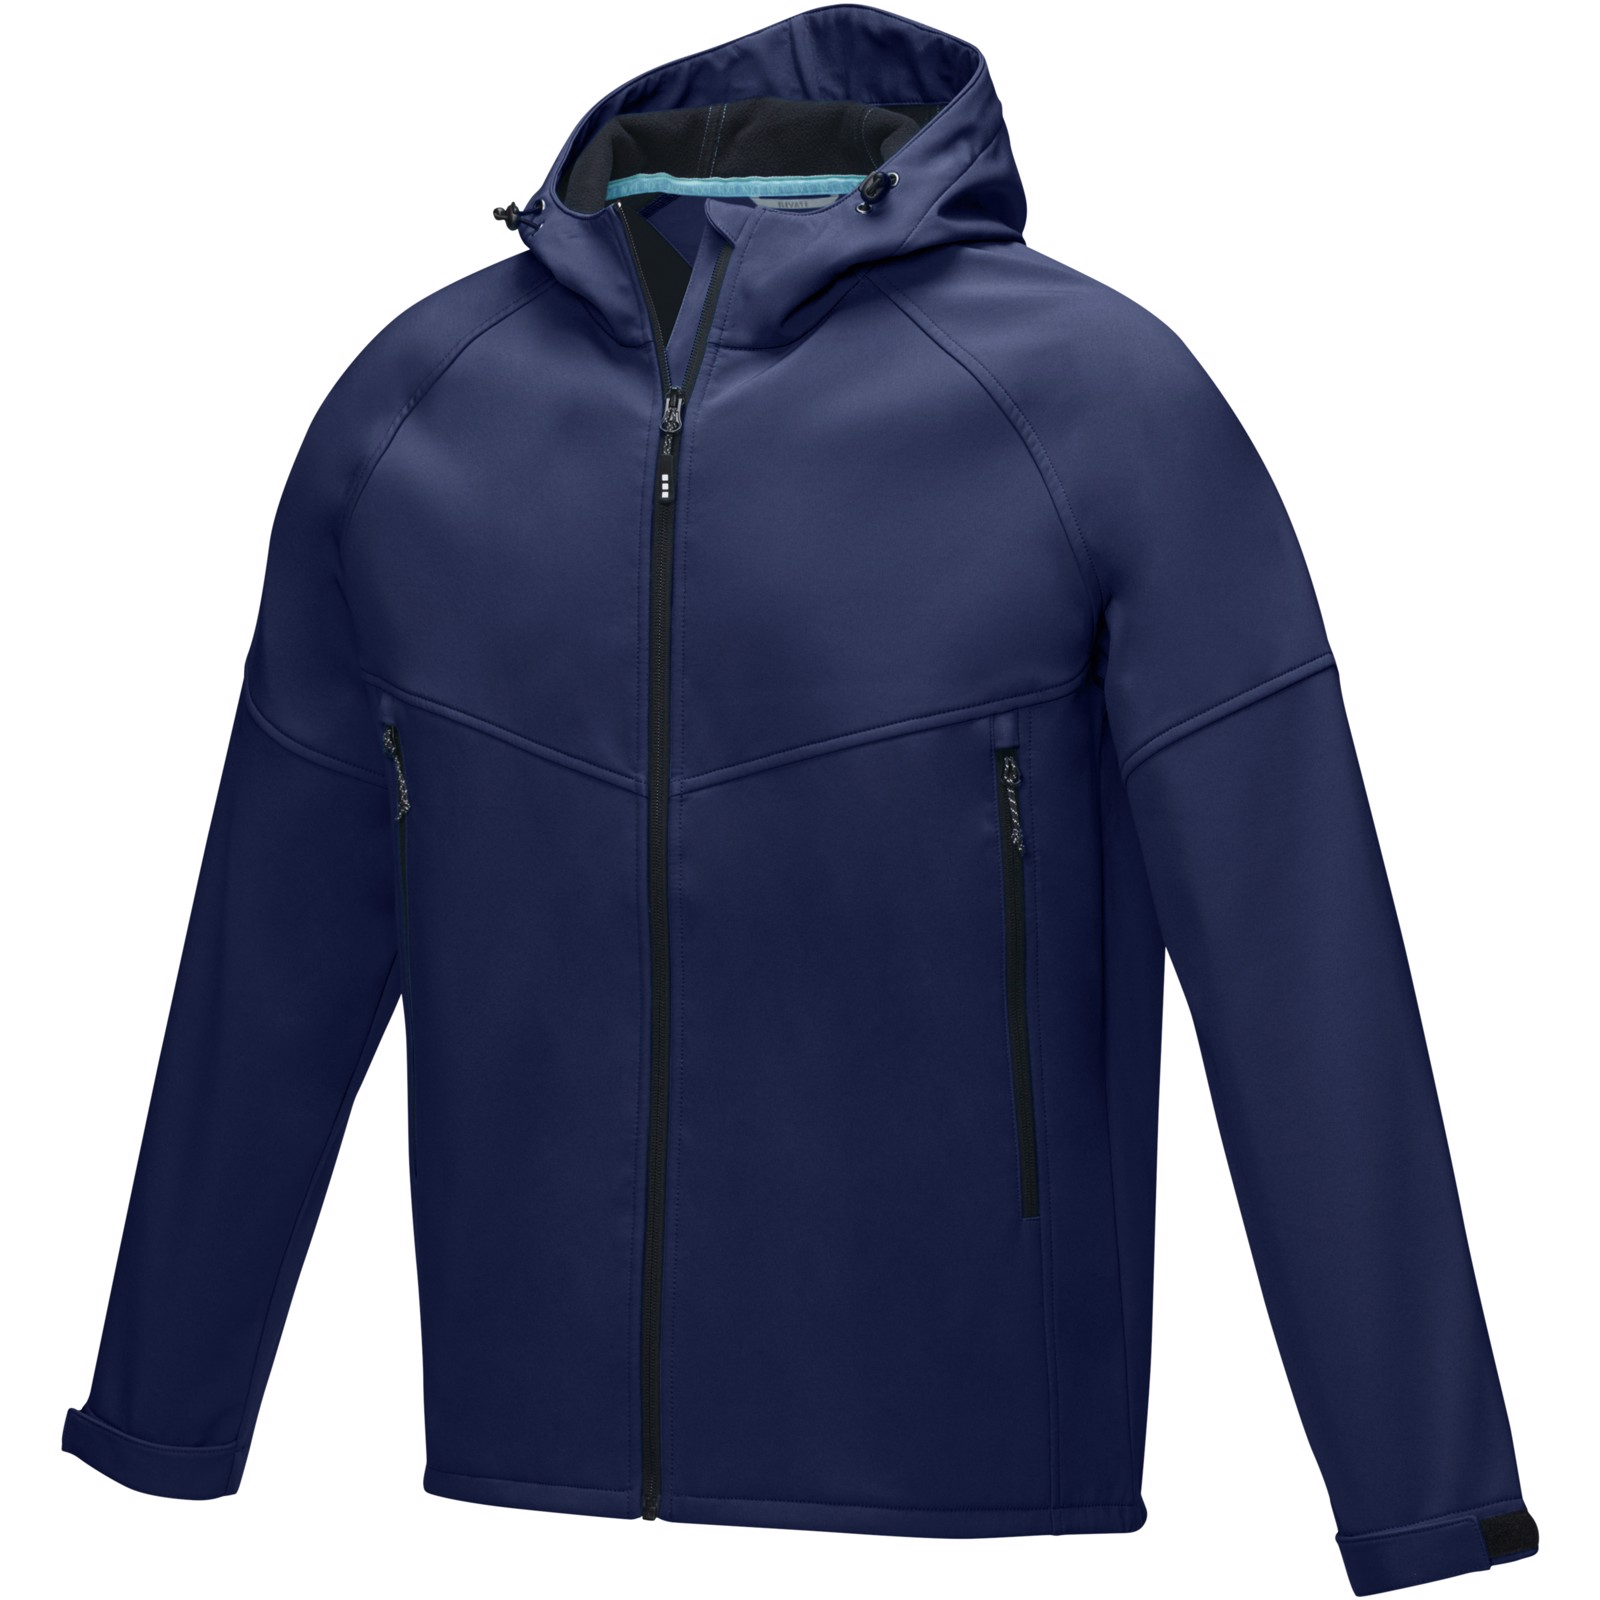 "Chaqueta softshell reciclada para hombre ""Coltan"" - Azul marino / L"